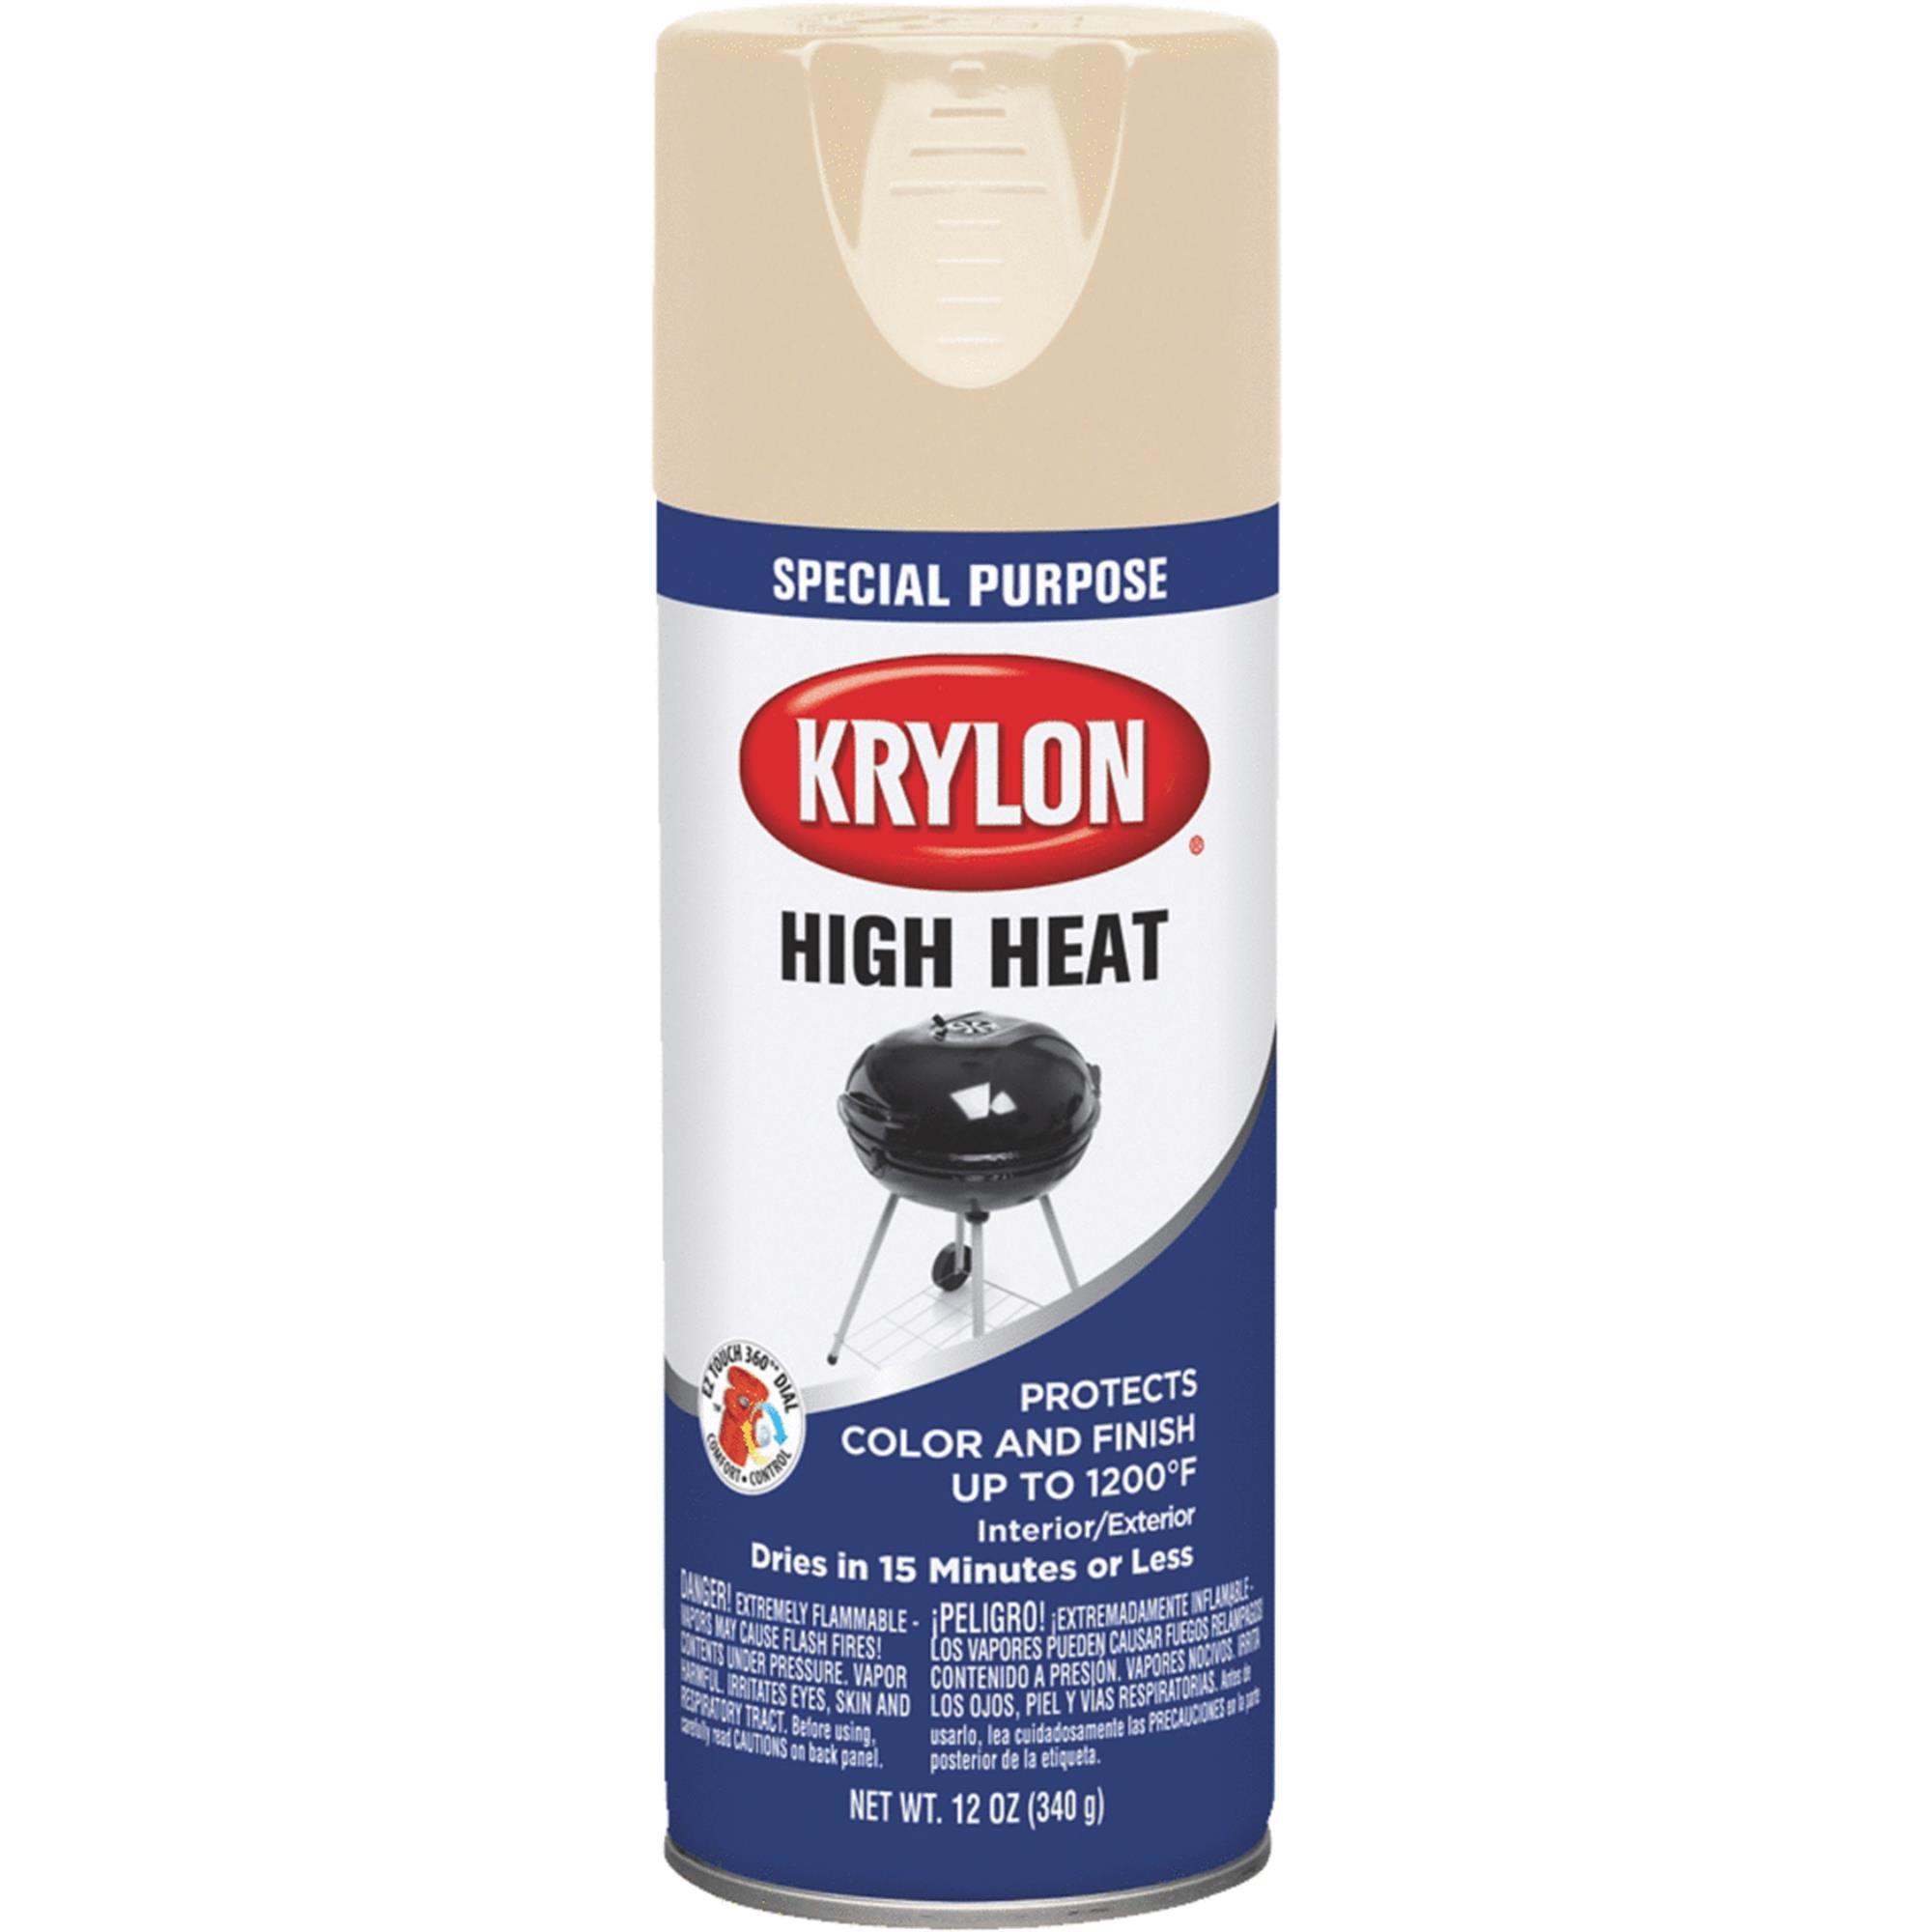 Krylon High Heat Spray Paint